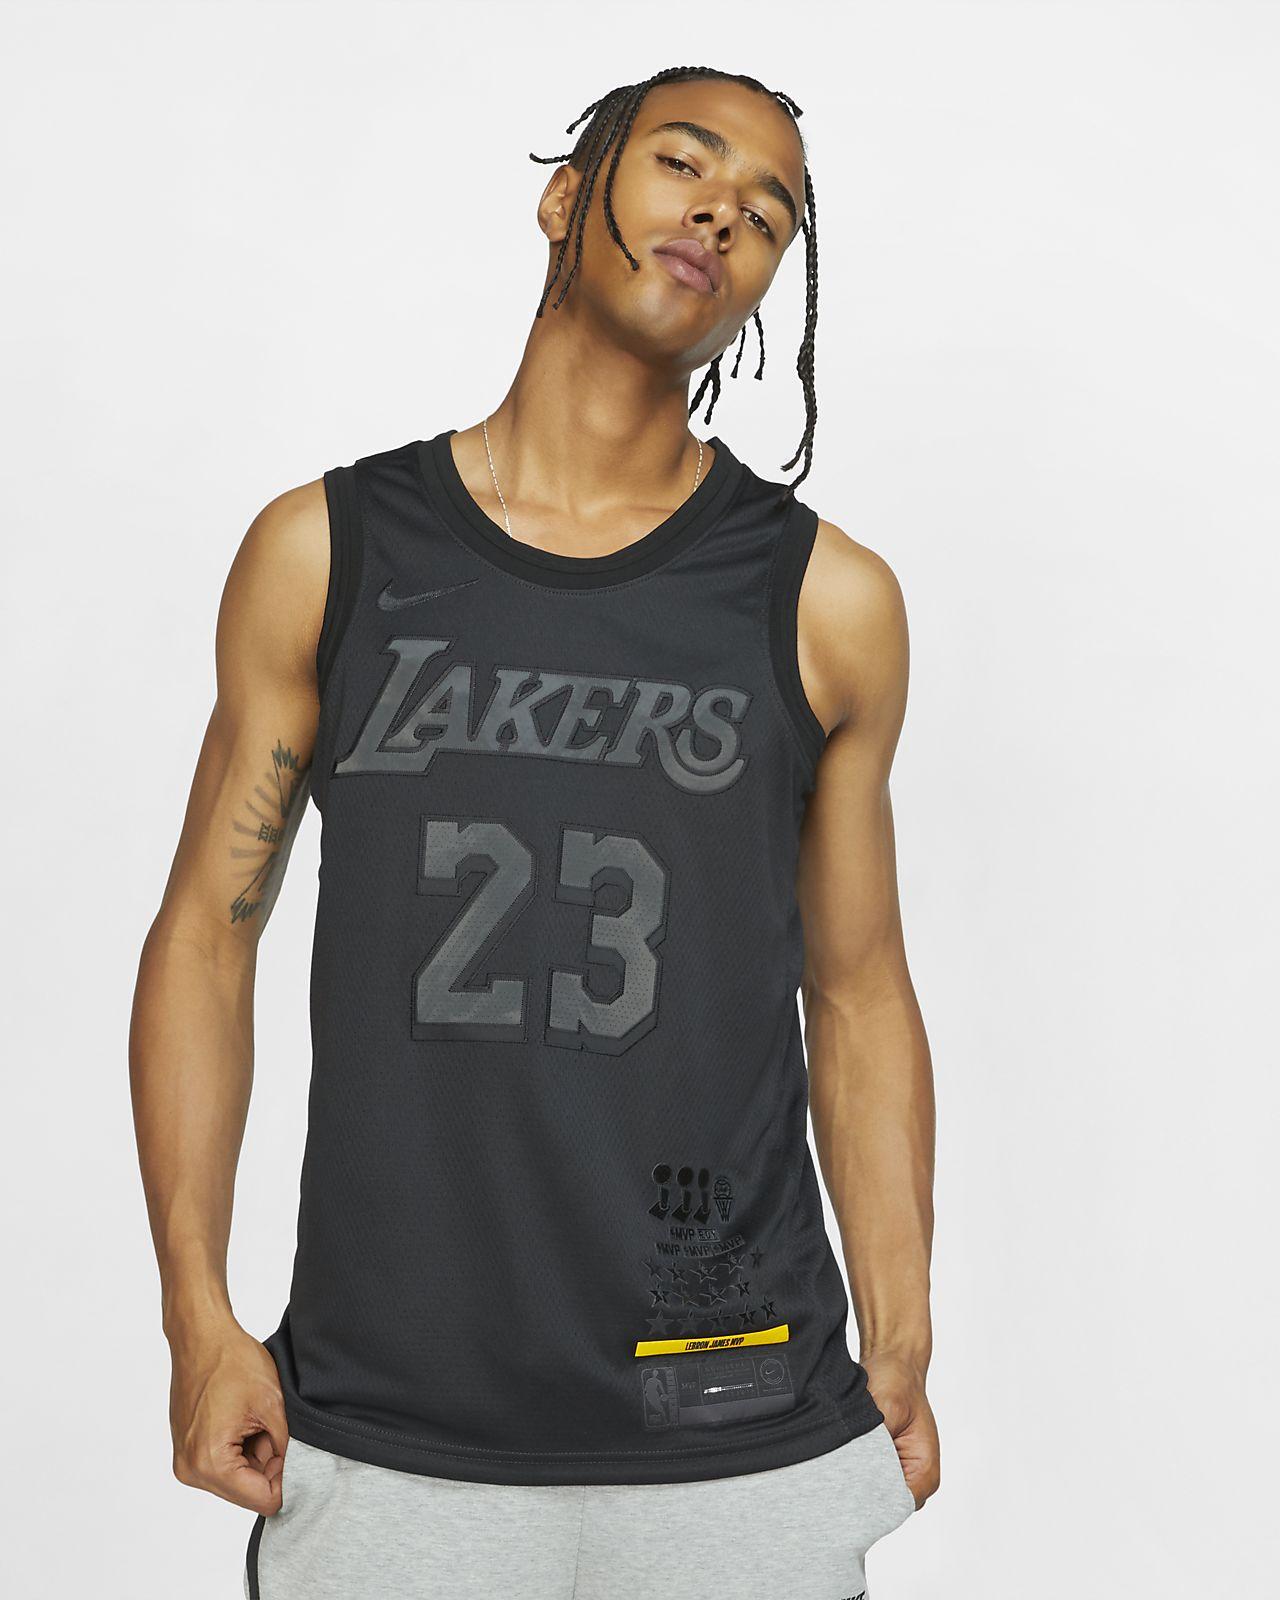 Nba Lebron James Swingmanlos Nike LakersCamiseta Hombre Connected Angeles Mvp xrBoWdCe